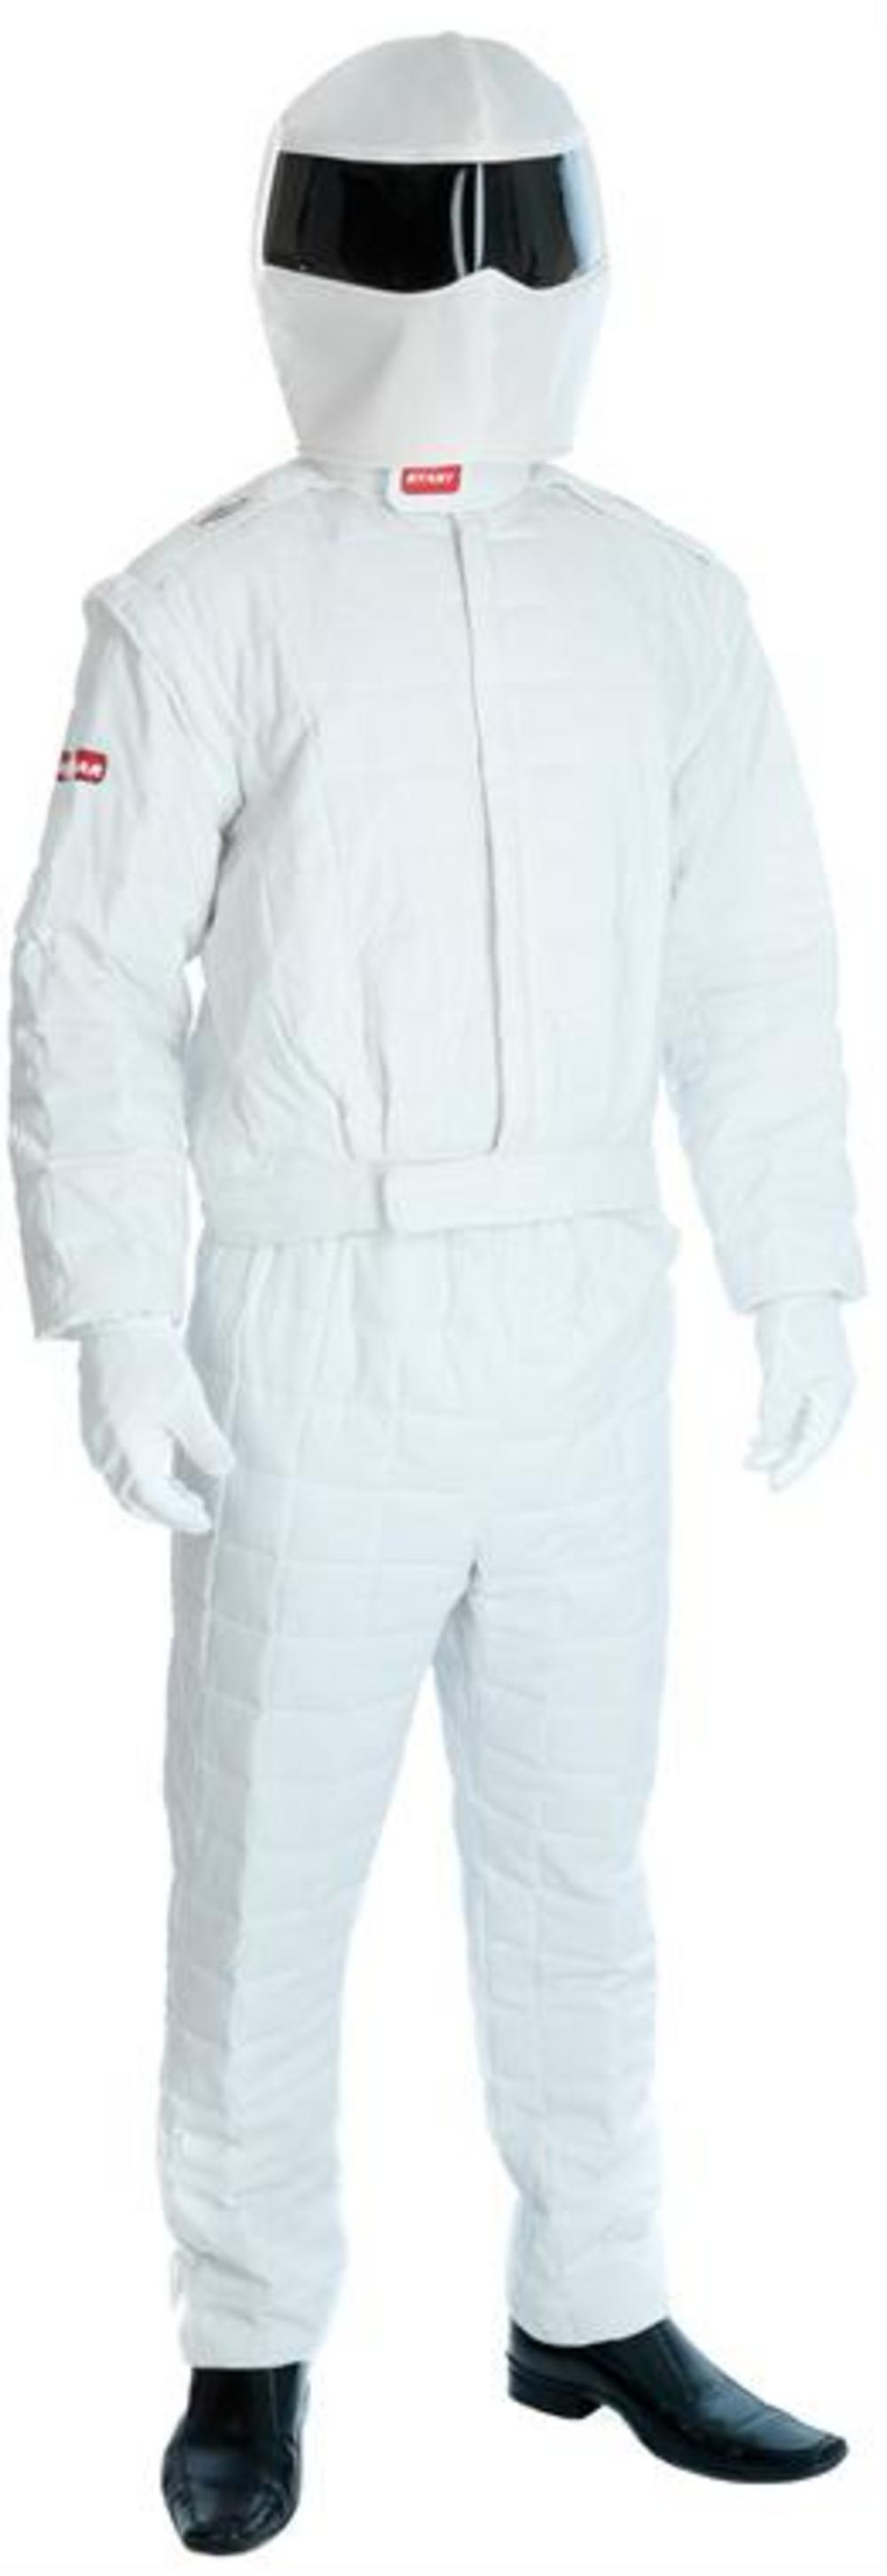 Mens' Racing Driver Fancy Dress Costume